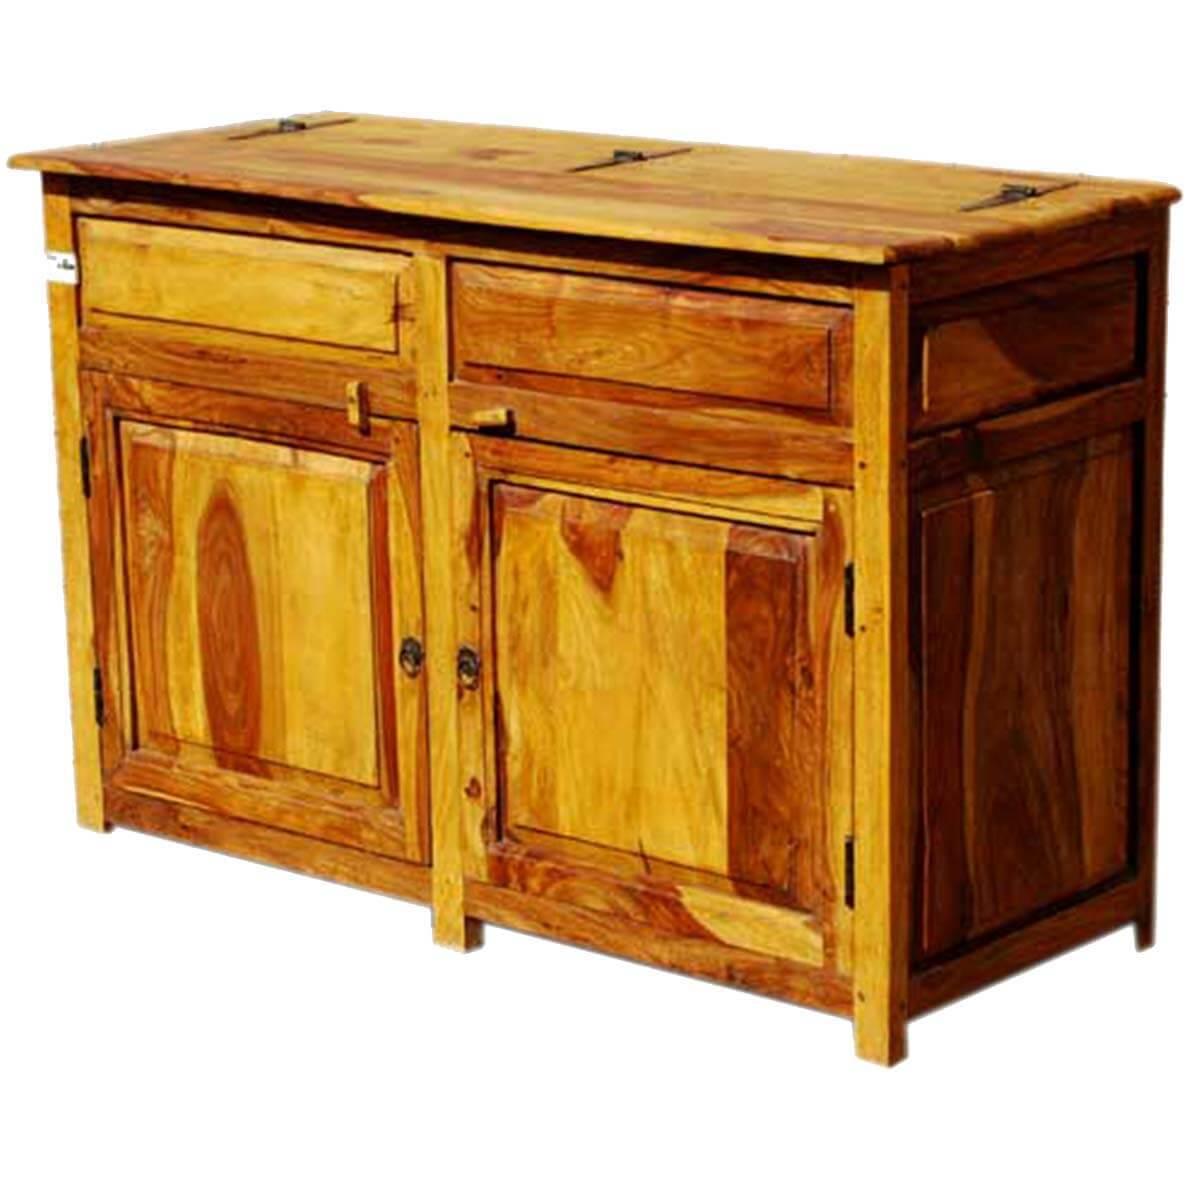 kitchen buffet storage cabinet kohler faucets home depot dallas ranch rustic solid wood 2 door